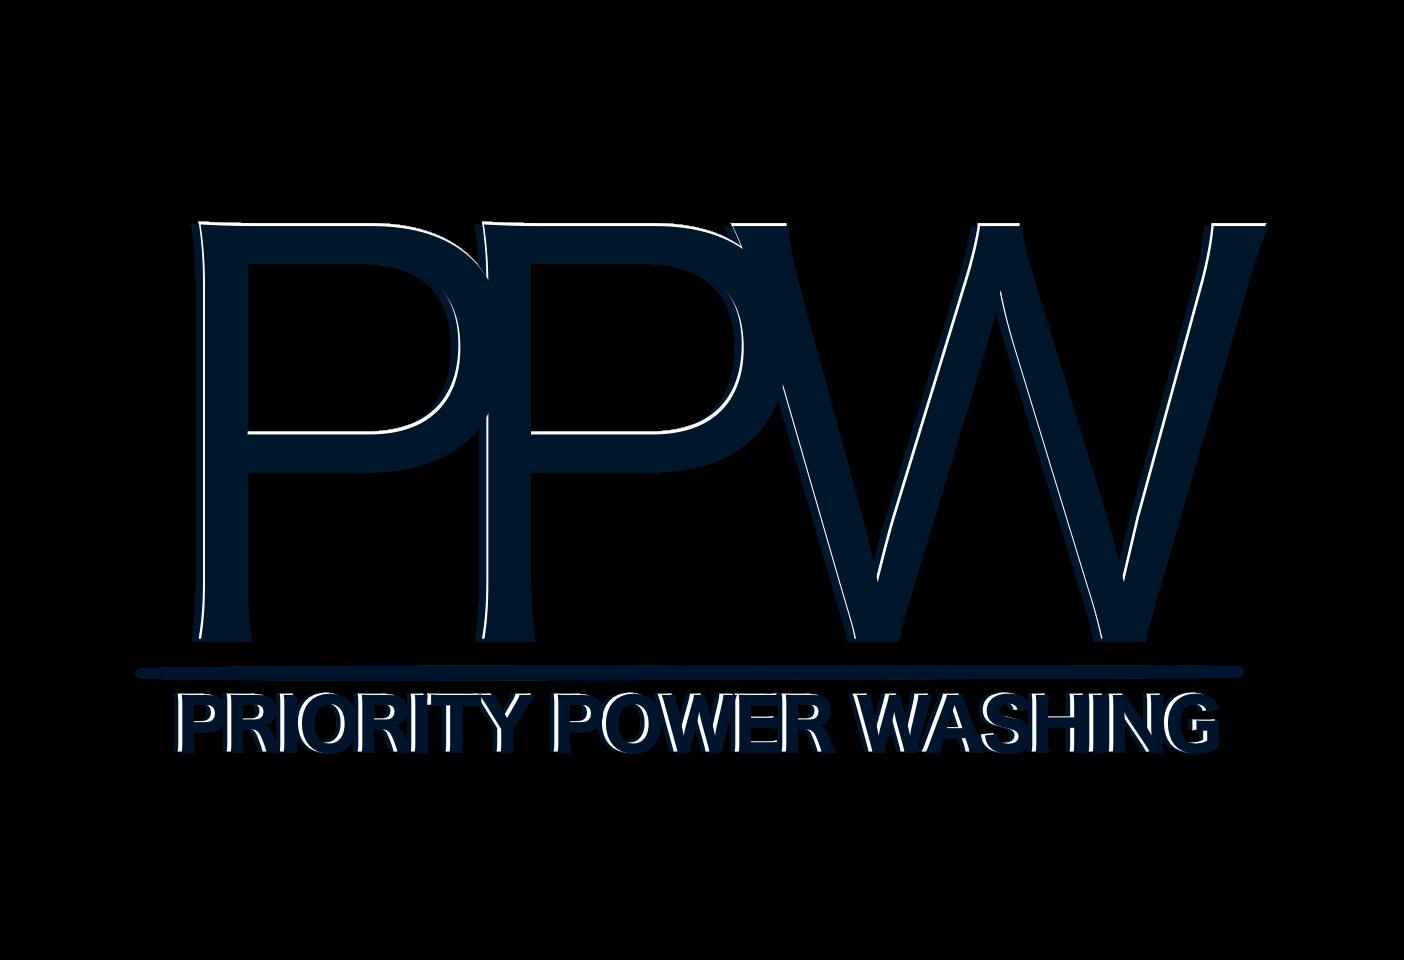 Priority Power Wash logo